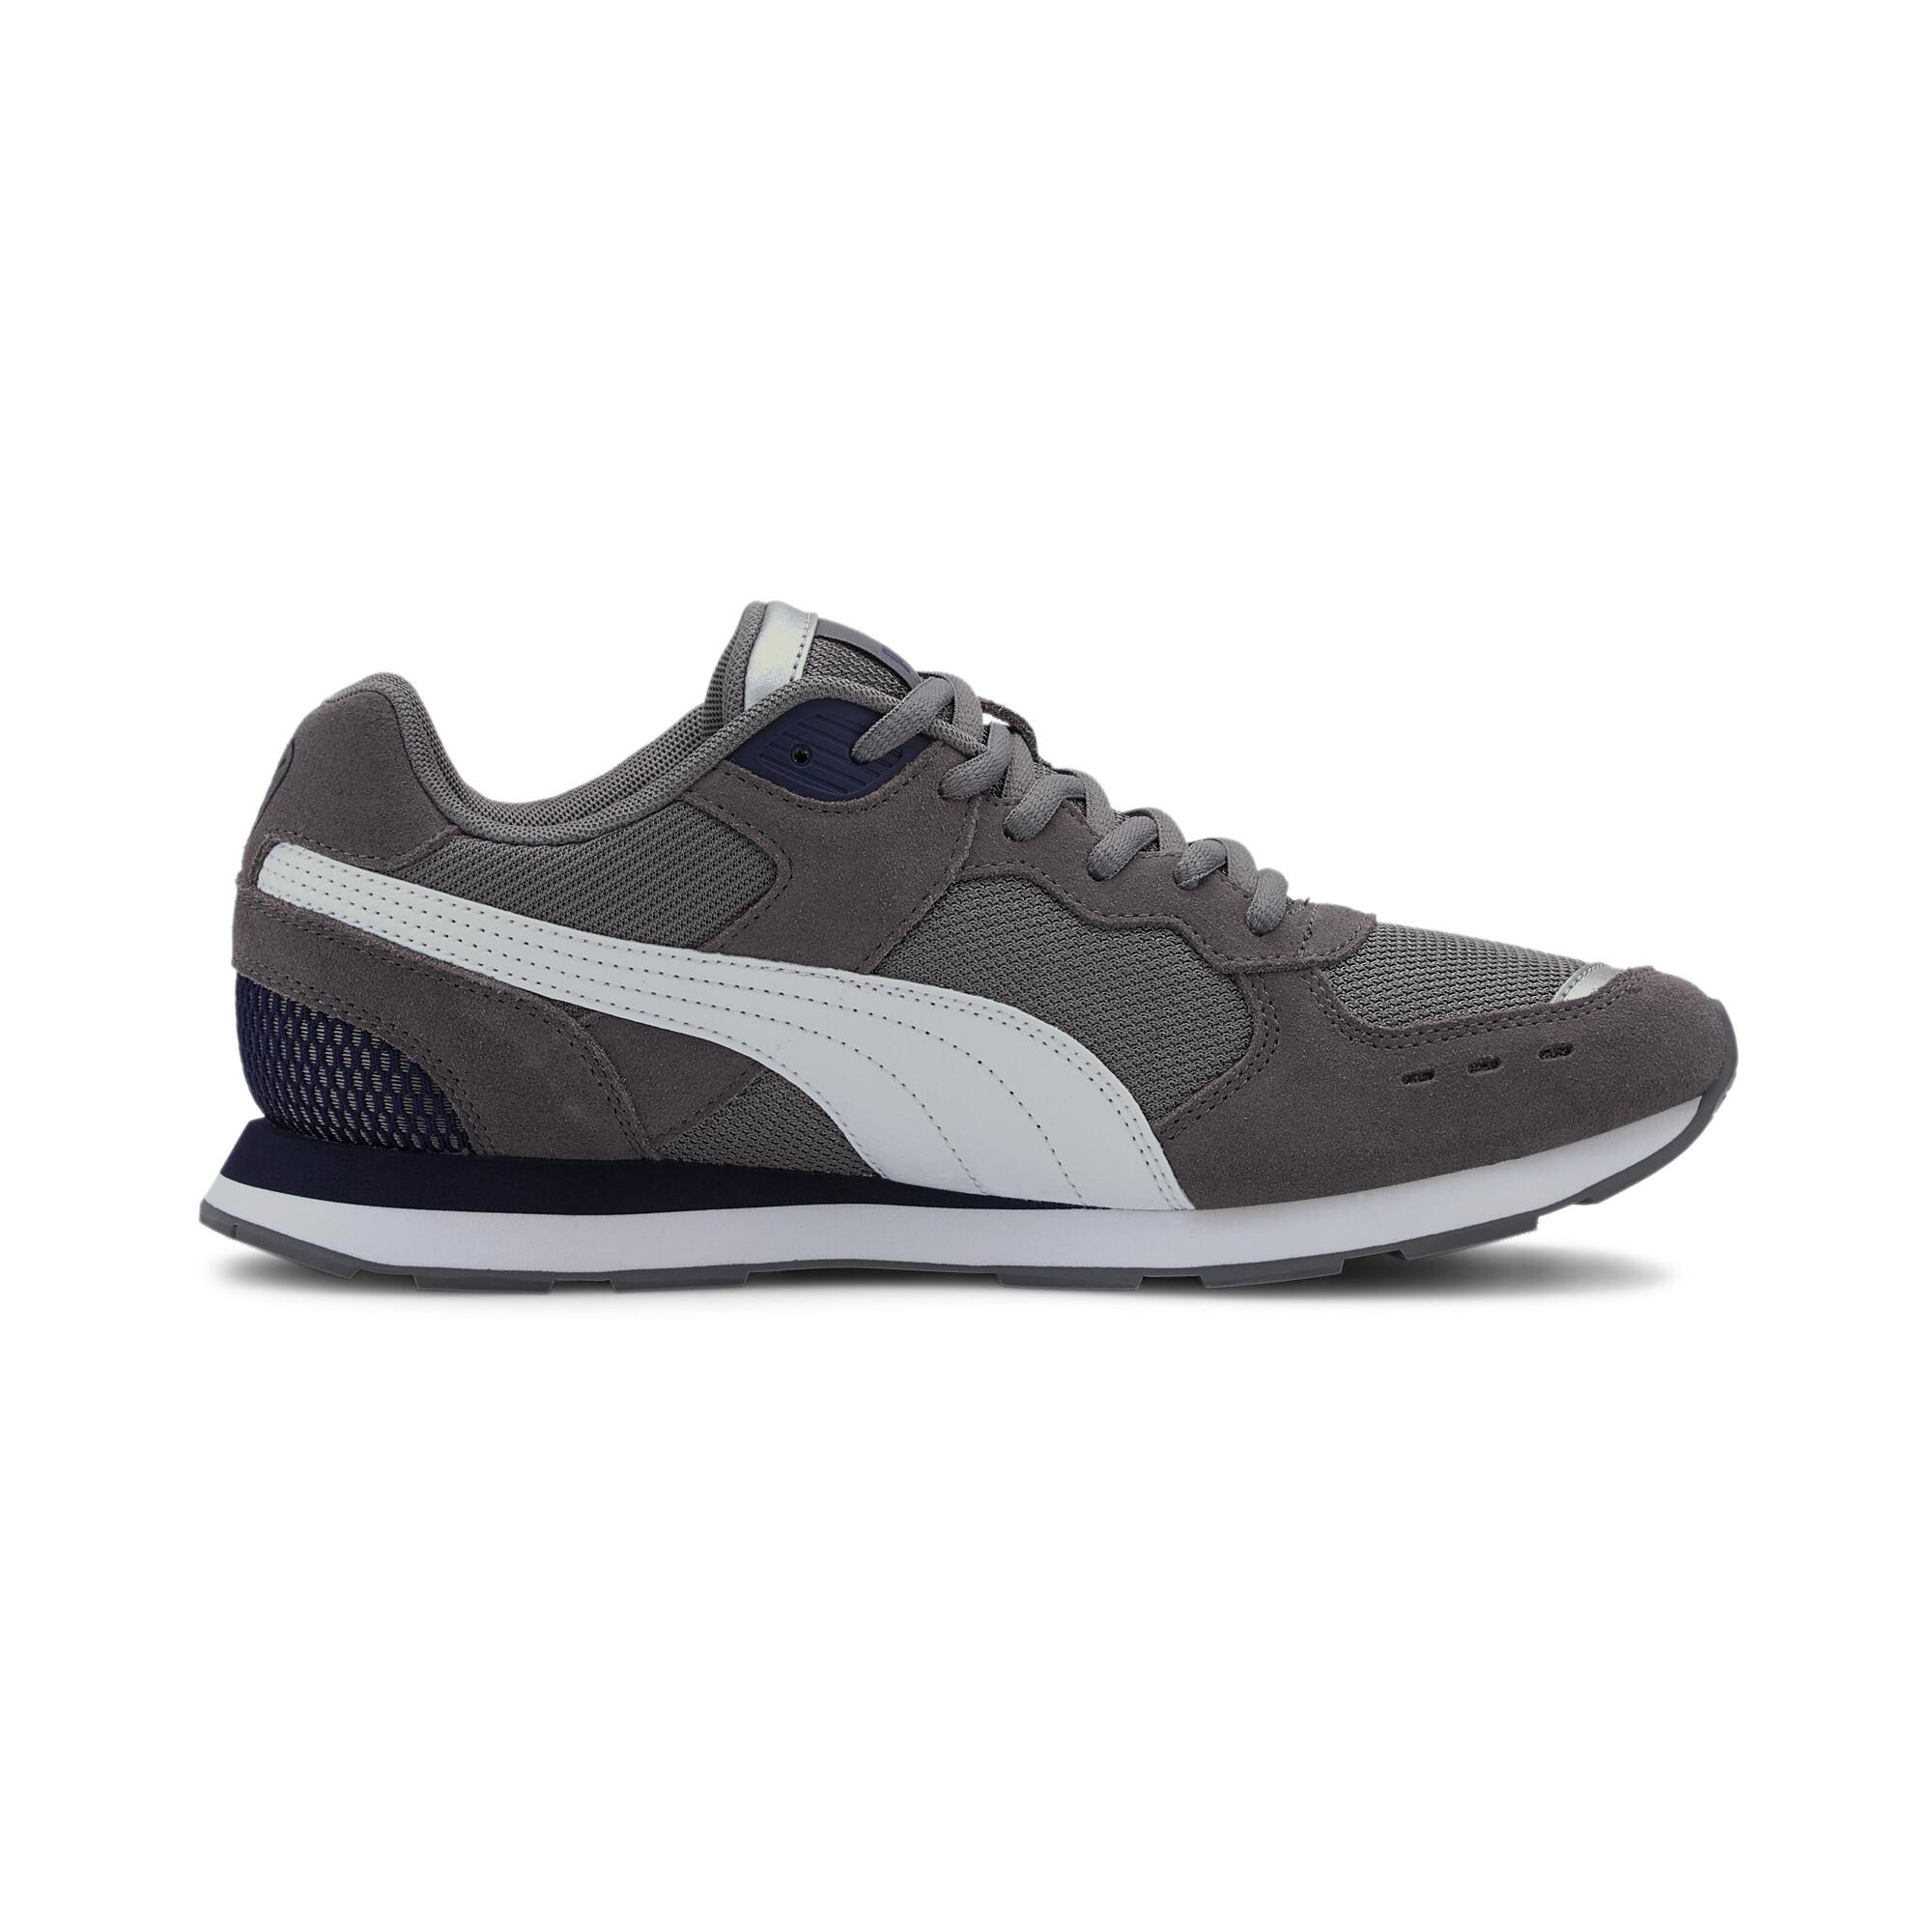 PUMA-Men-039-s-Vista-Sneakers thumbnail 48